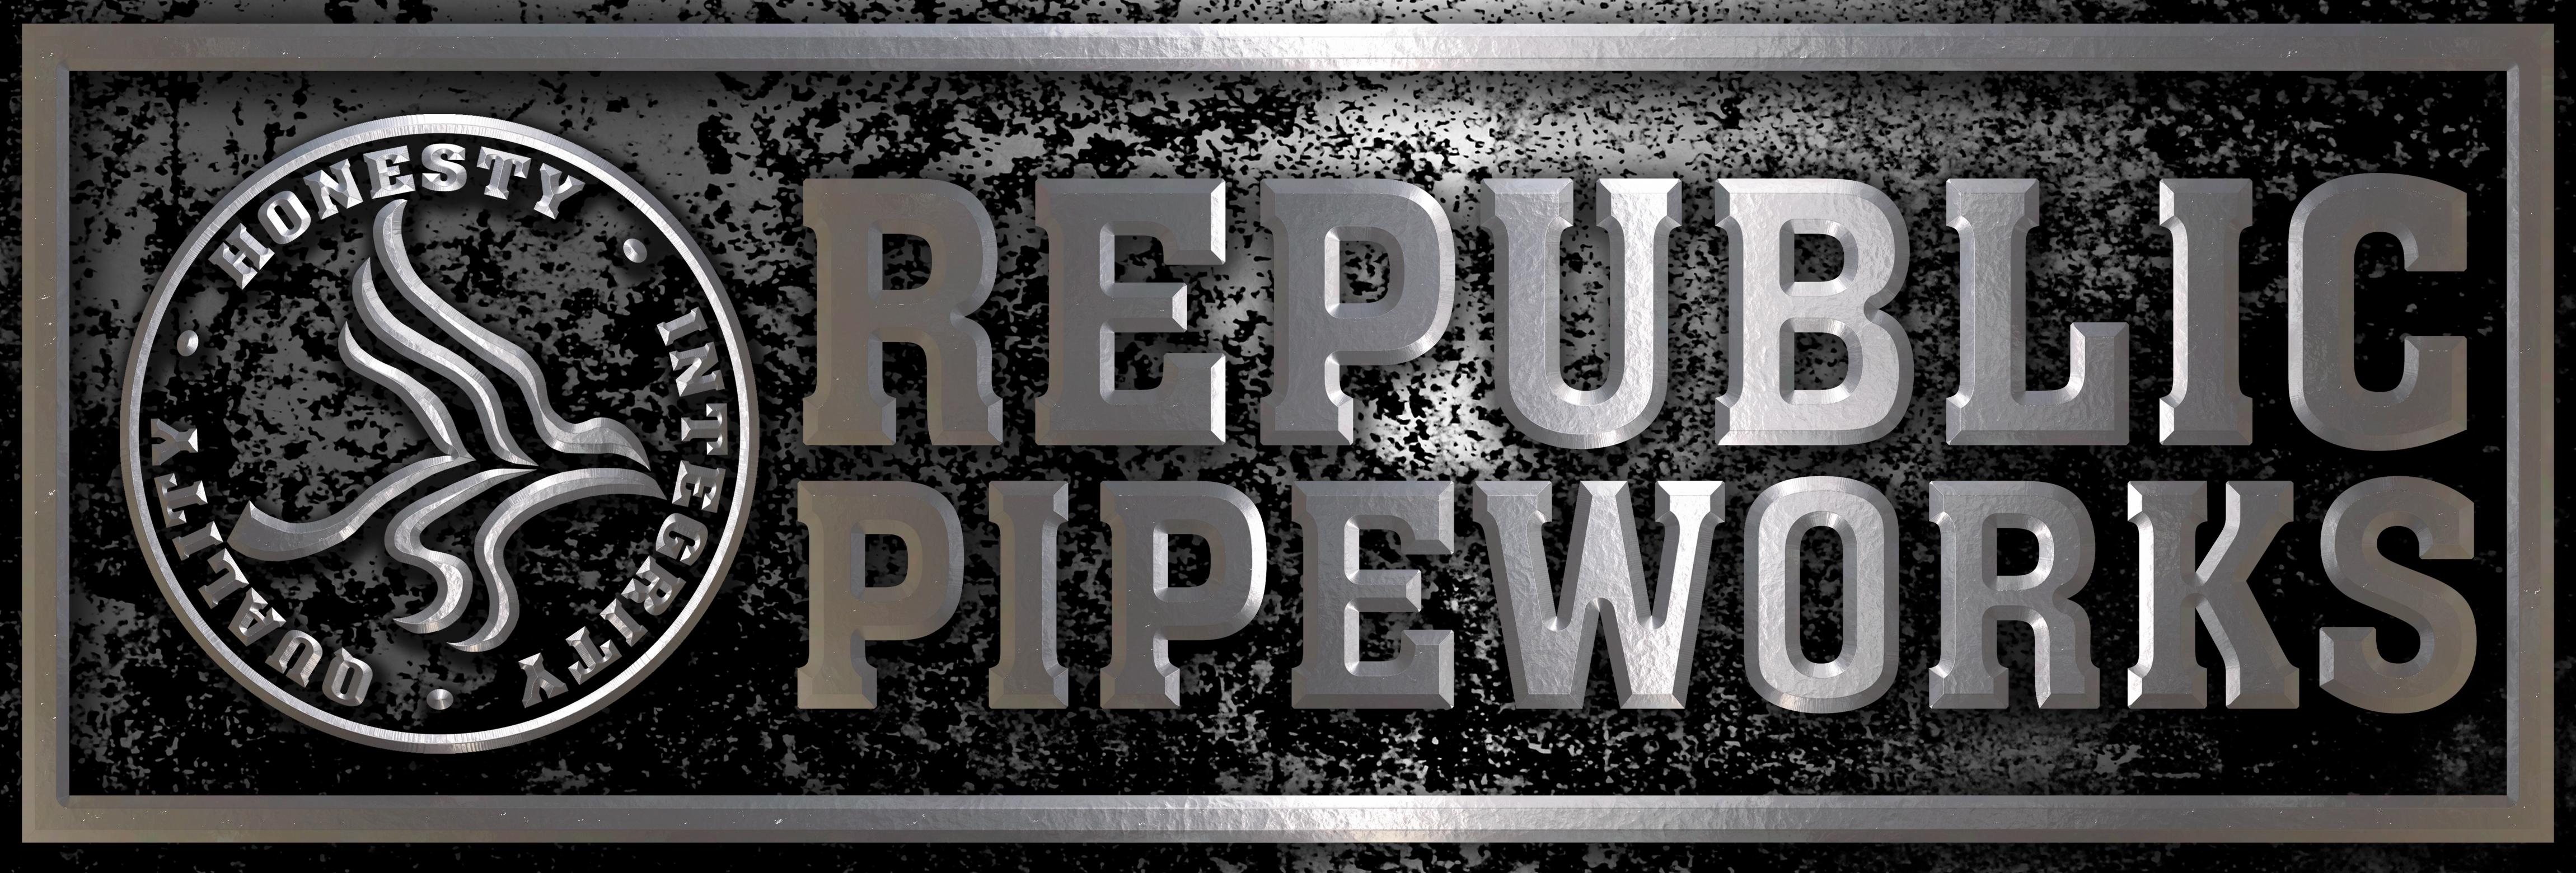 Plumbing Piping Maintenance Sewer&Drain